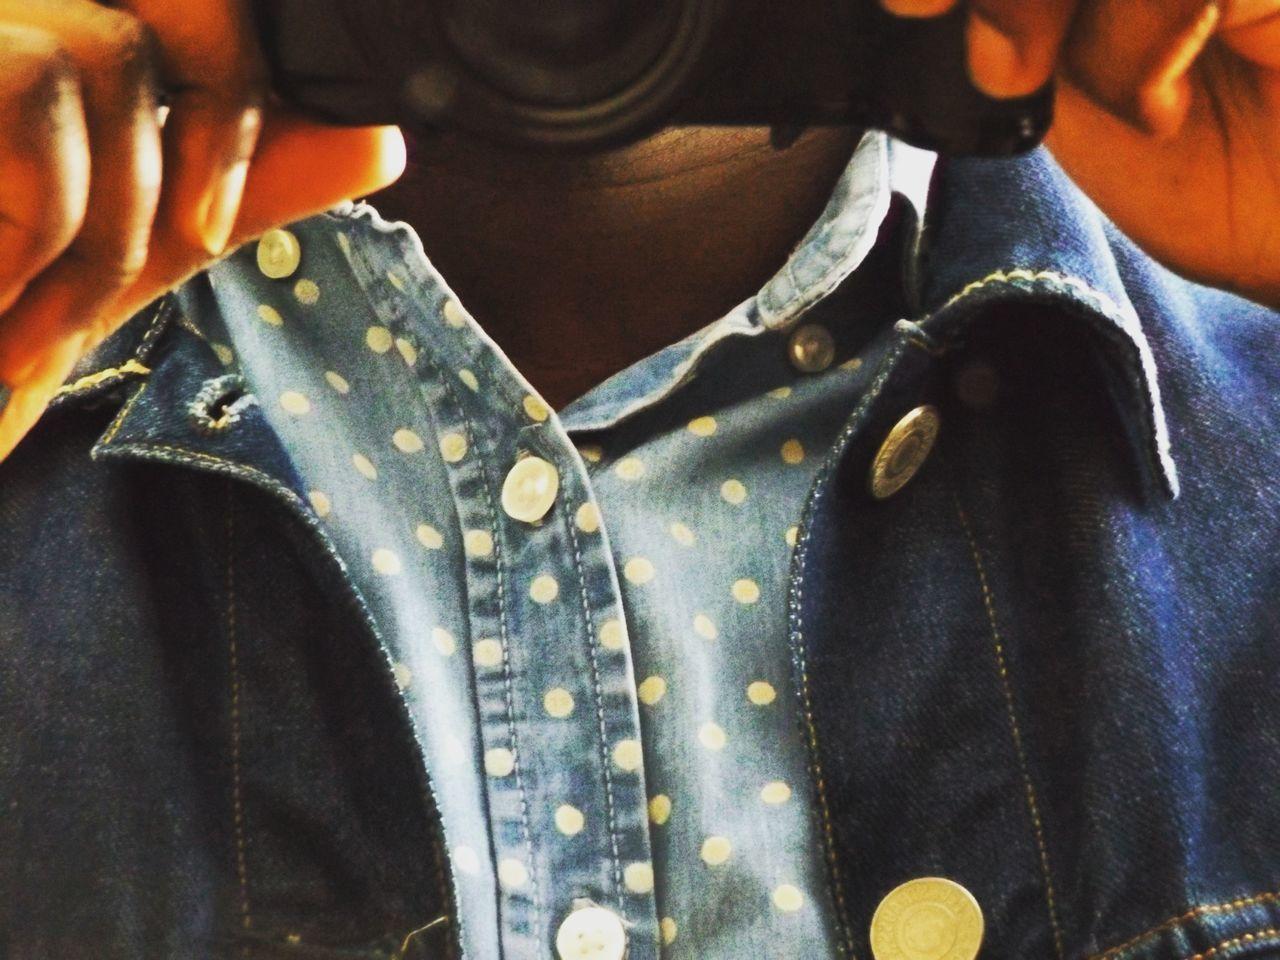 pop ya collar. Close-up Day Human Hand Indoors  Midsection One Person Selfportrait Canadiantuxedo Denim DenimOnDenim People Real People Fujifilm Shirt Polkadots Denim Jacket